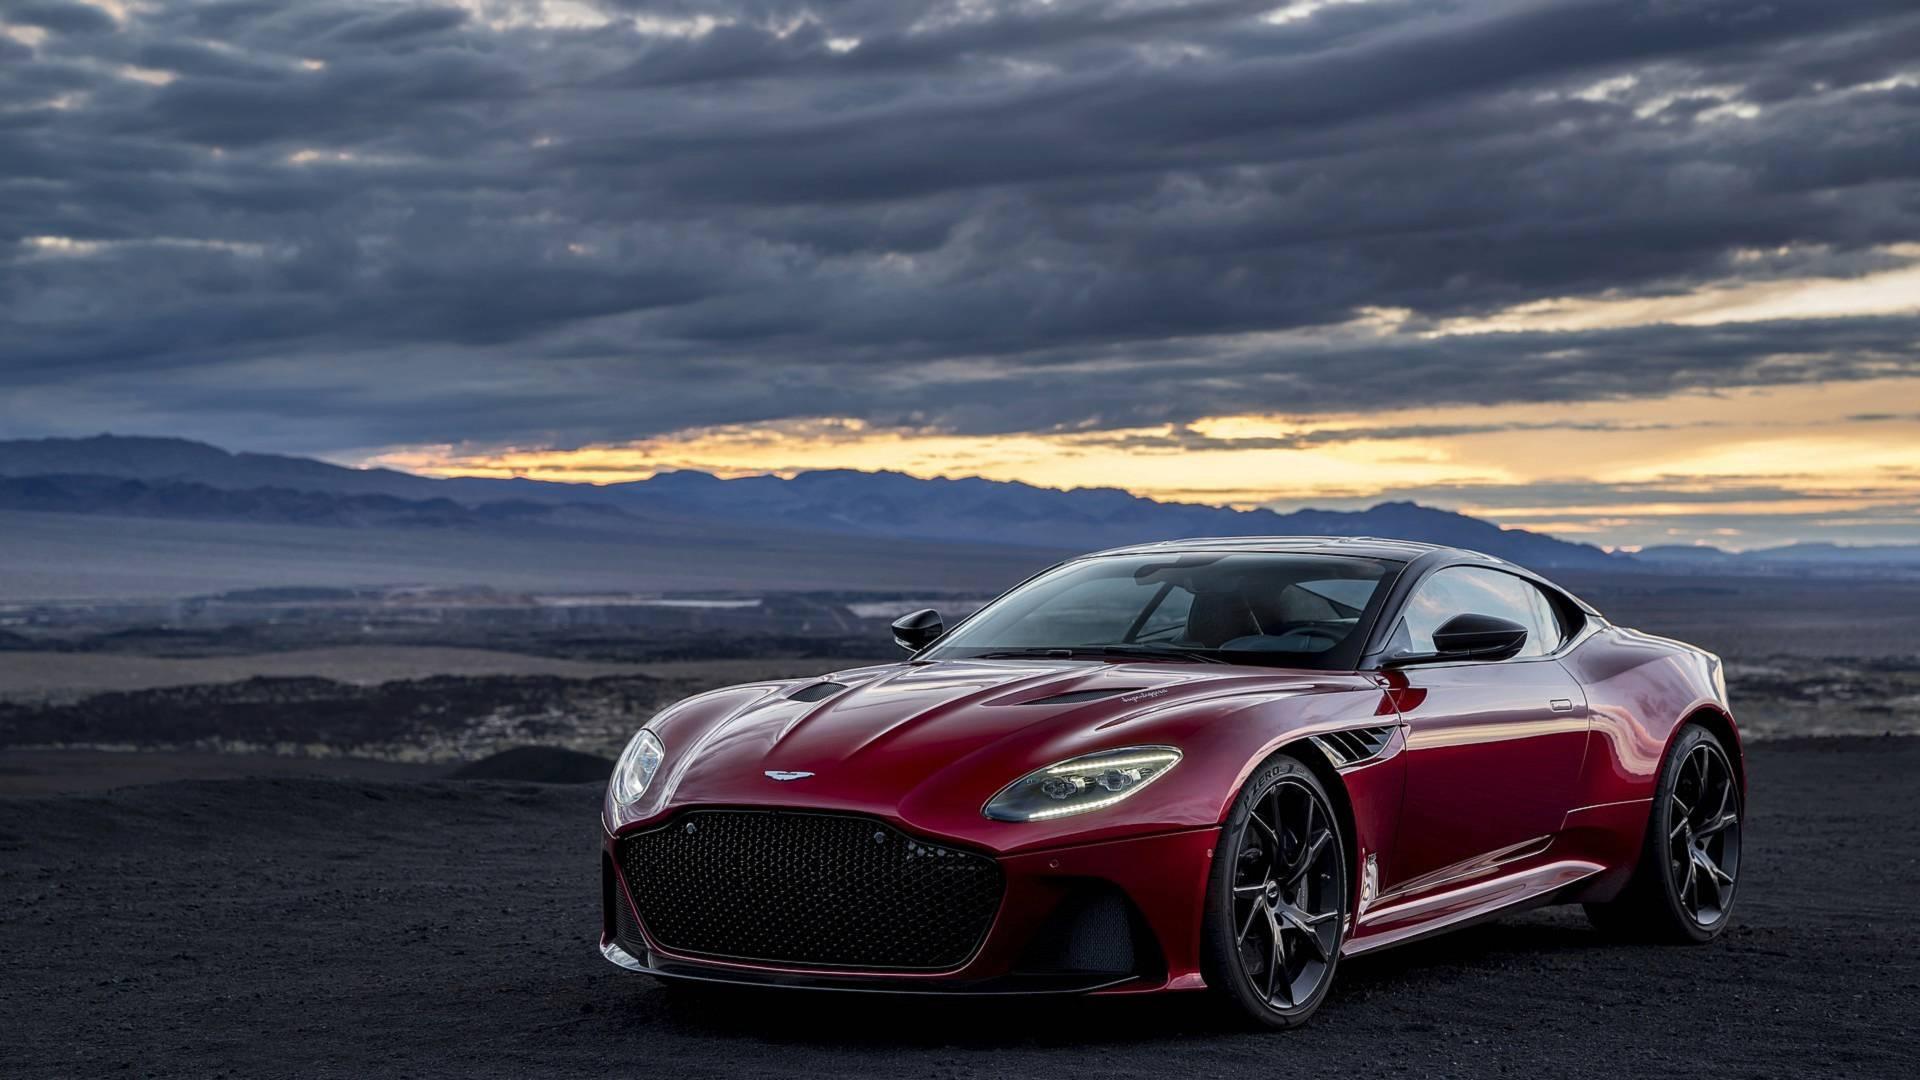 2019 - [Aston Martin] DBS Superleggera - Page 2 2019-aston-martin-dbs-superleggera